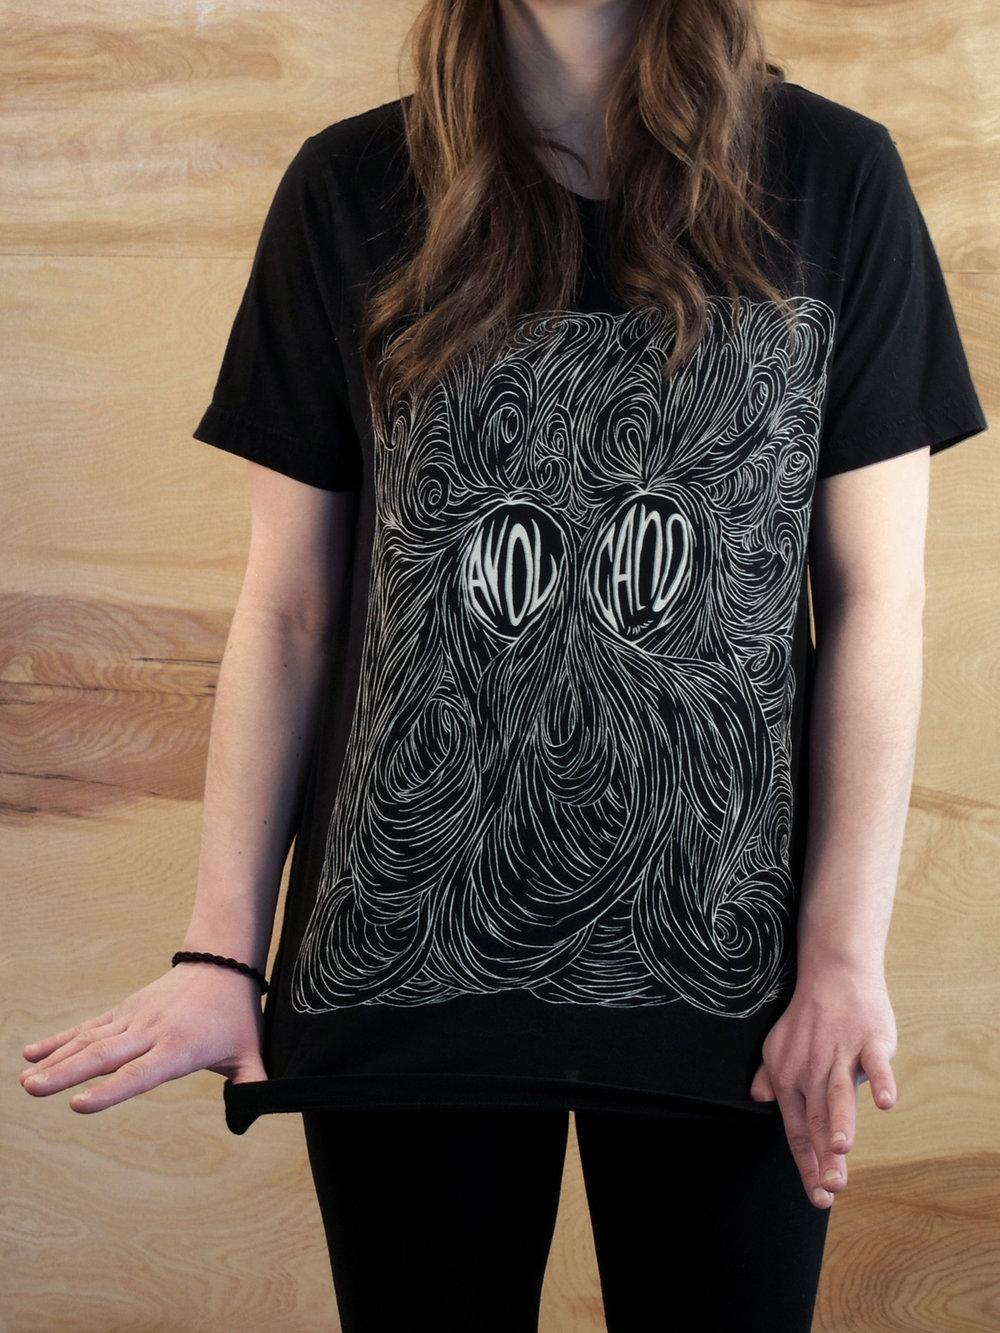 A_VOLCANO_shirt_002.jpg